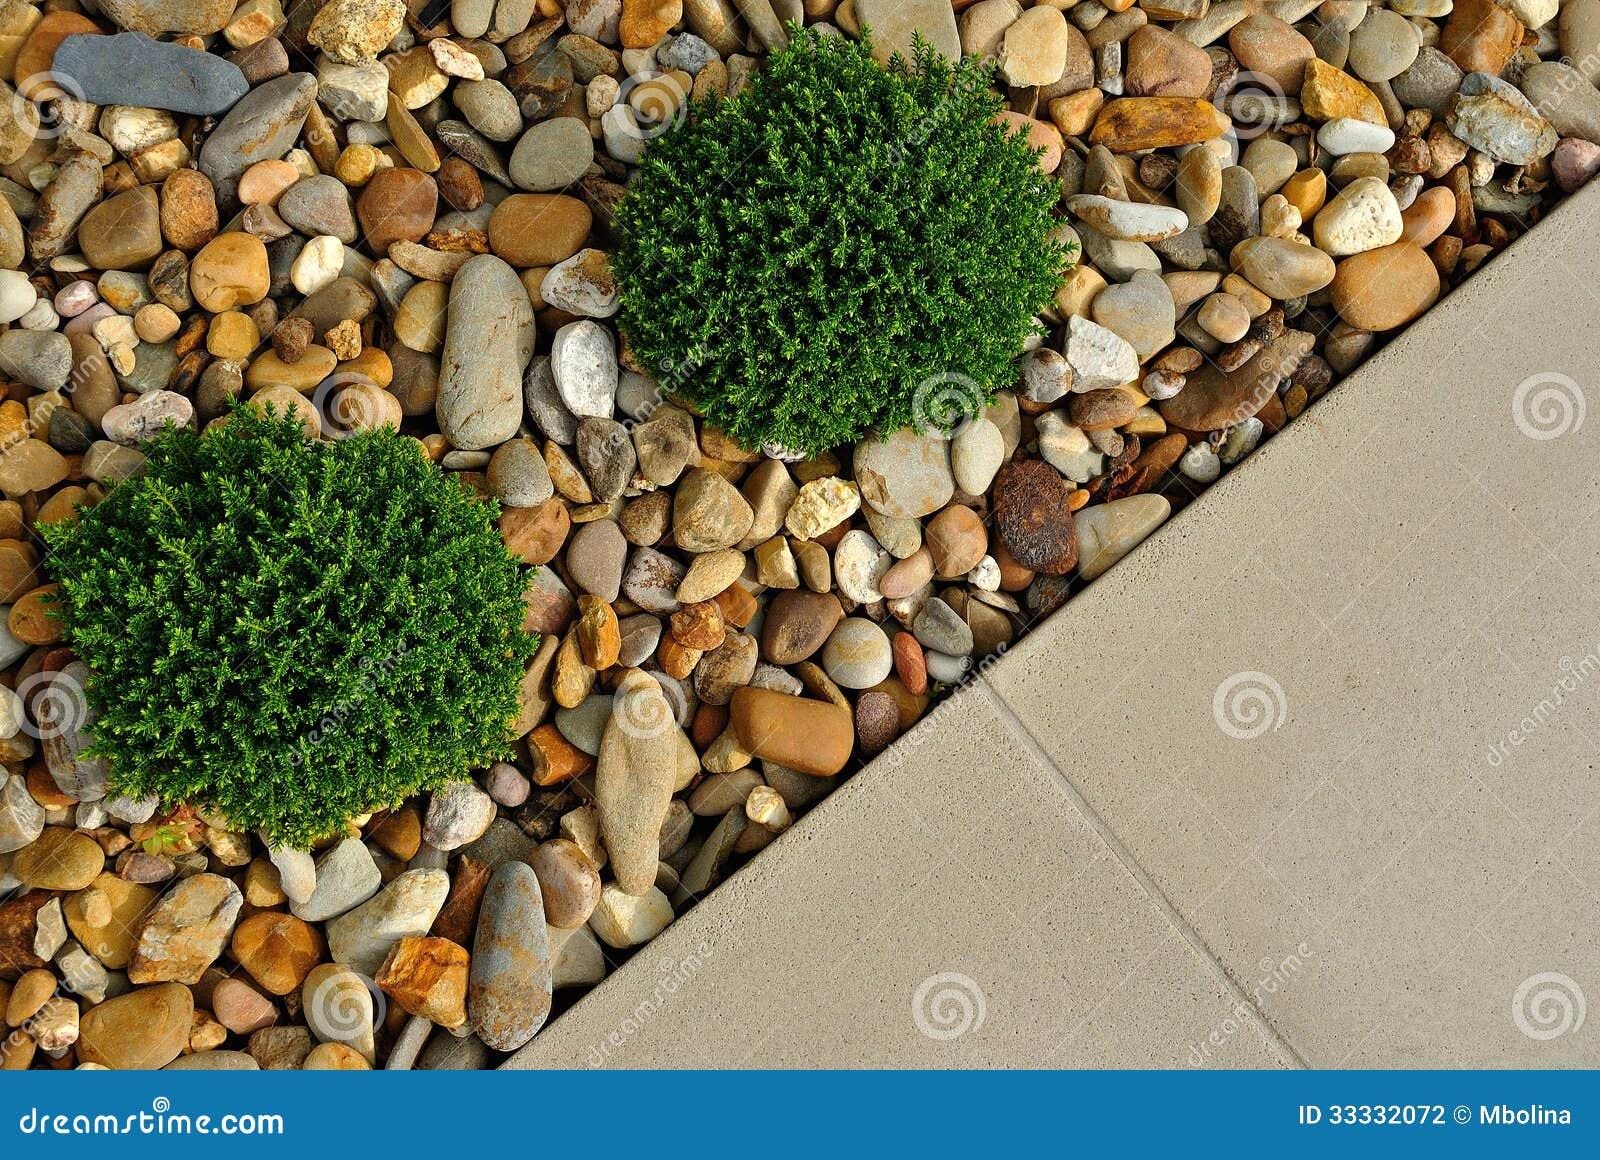 Landscape Outdoor Garden Design Stock Photography Image 33332072